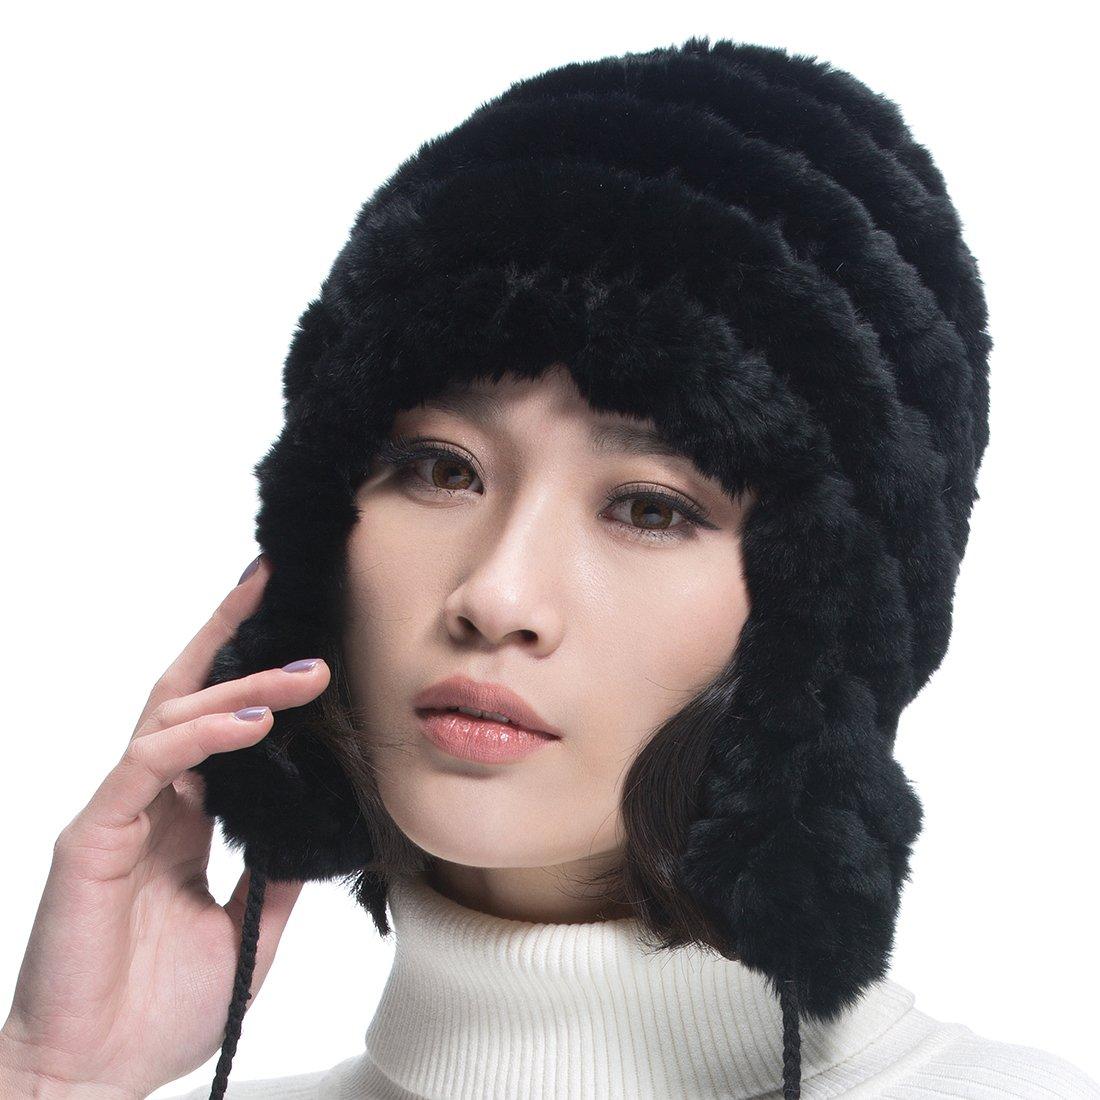 URSFUR  Women's Rex Rabbit Fur Hats Winter Ear Cap Flexible Multicolor (Black)